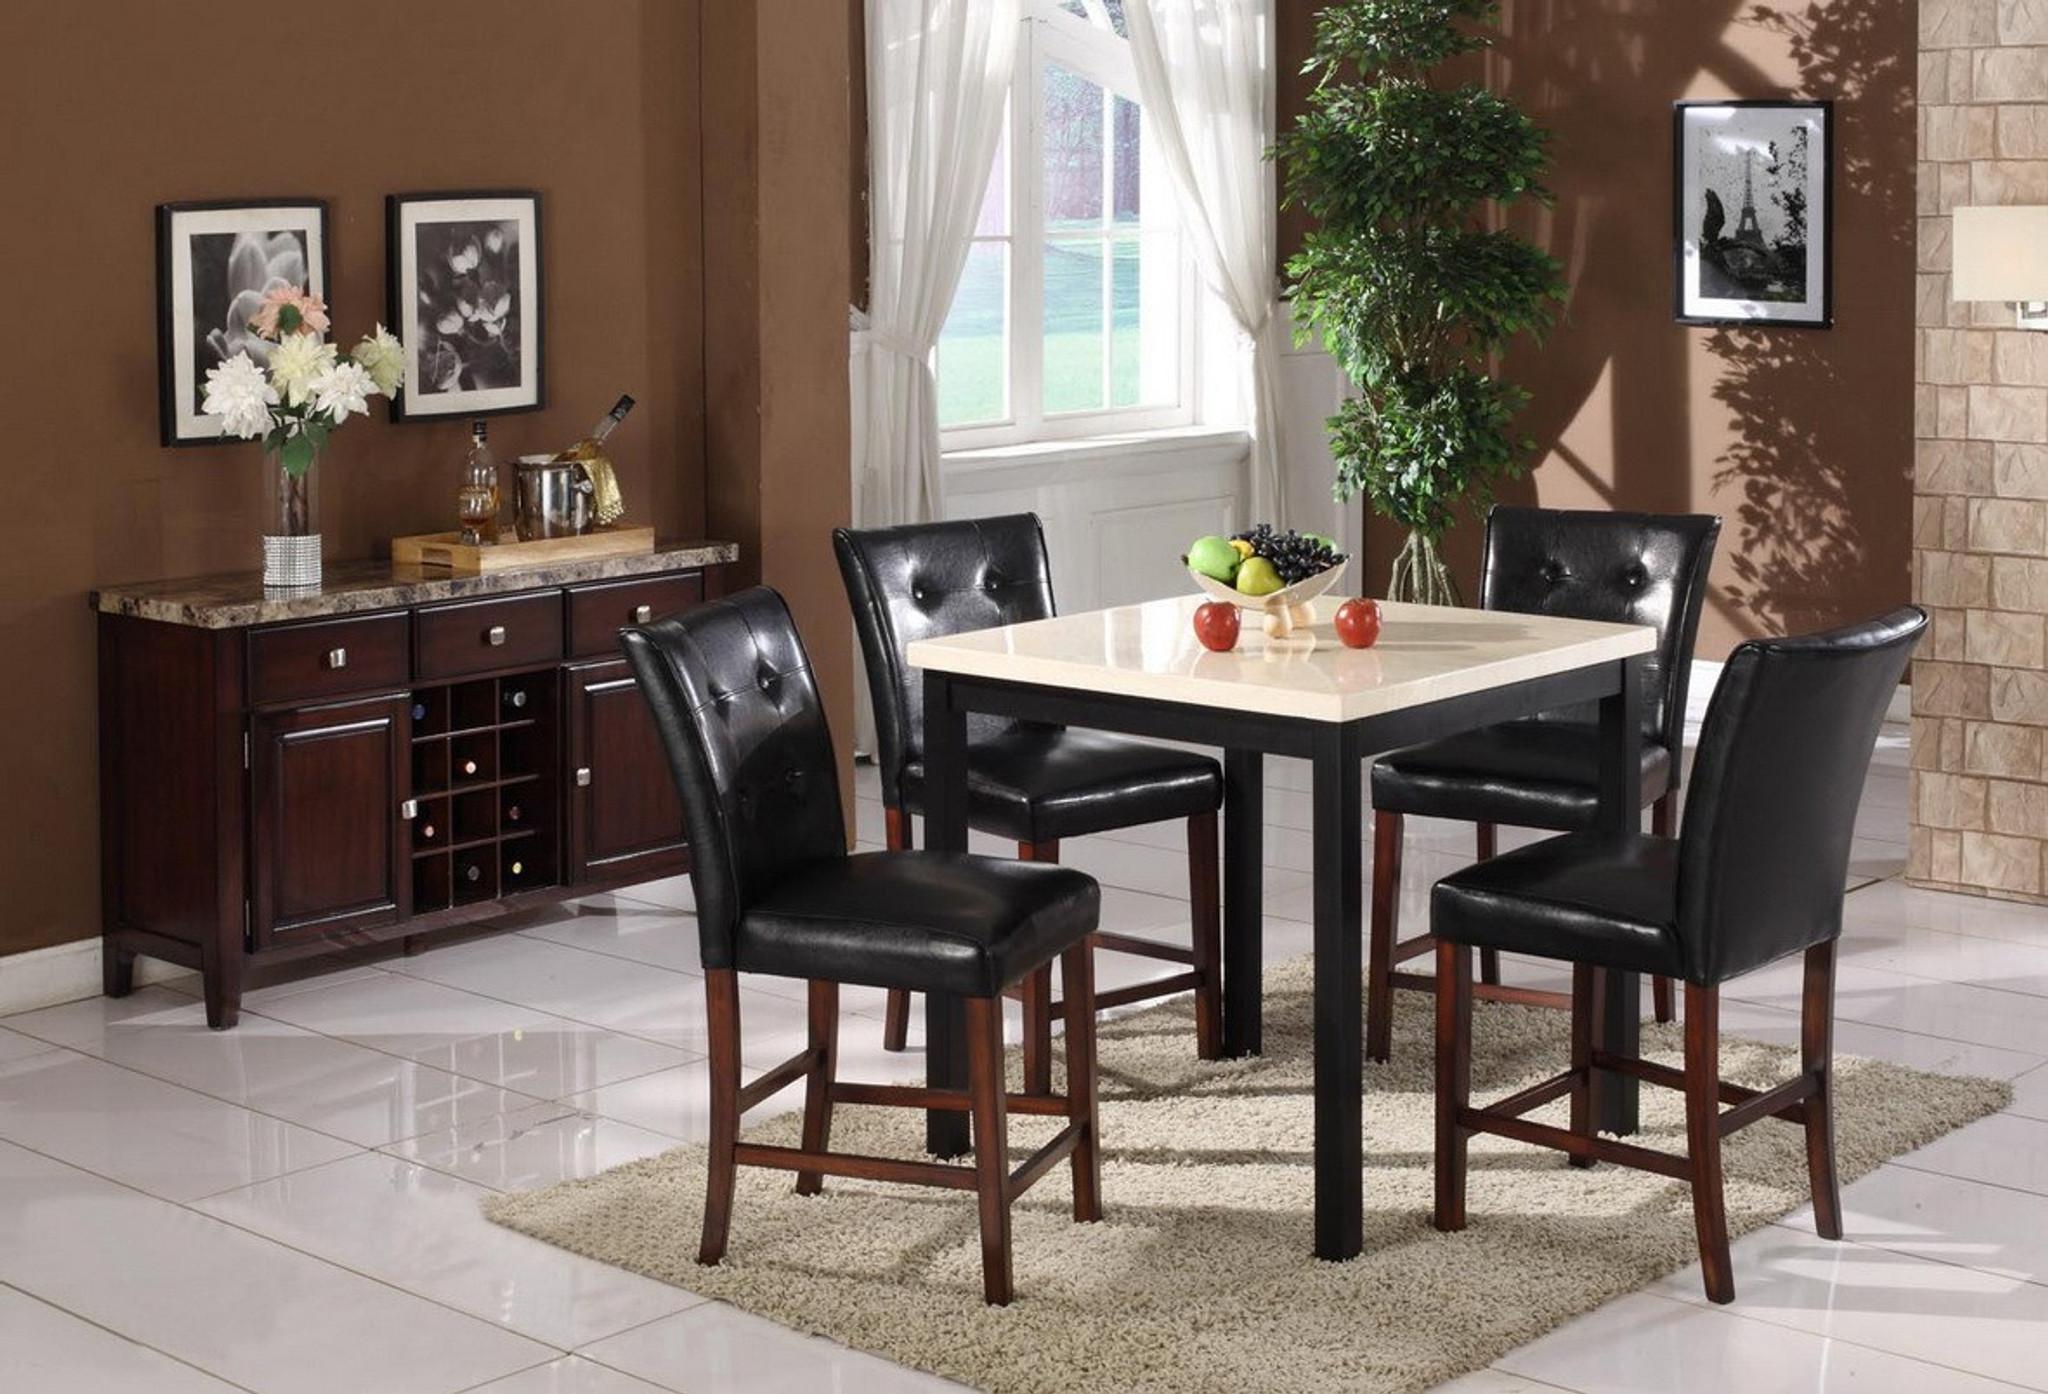 Astonishing Samuele Counter Height Table Bar Stool 5 Pc Set Beatyapartments Chair Design Images Beatyapartmentscom